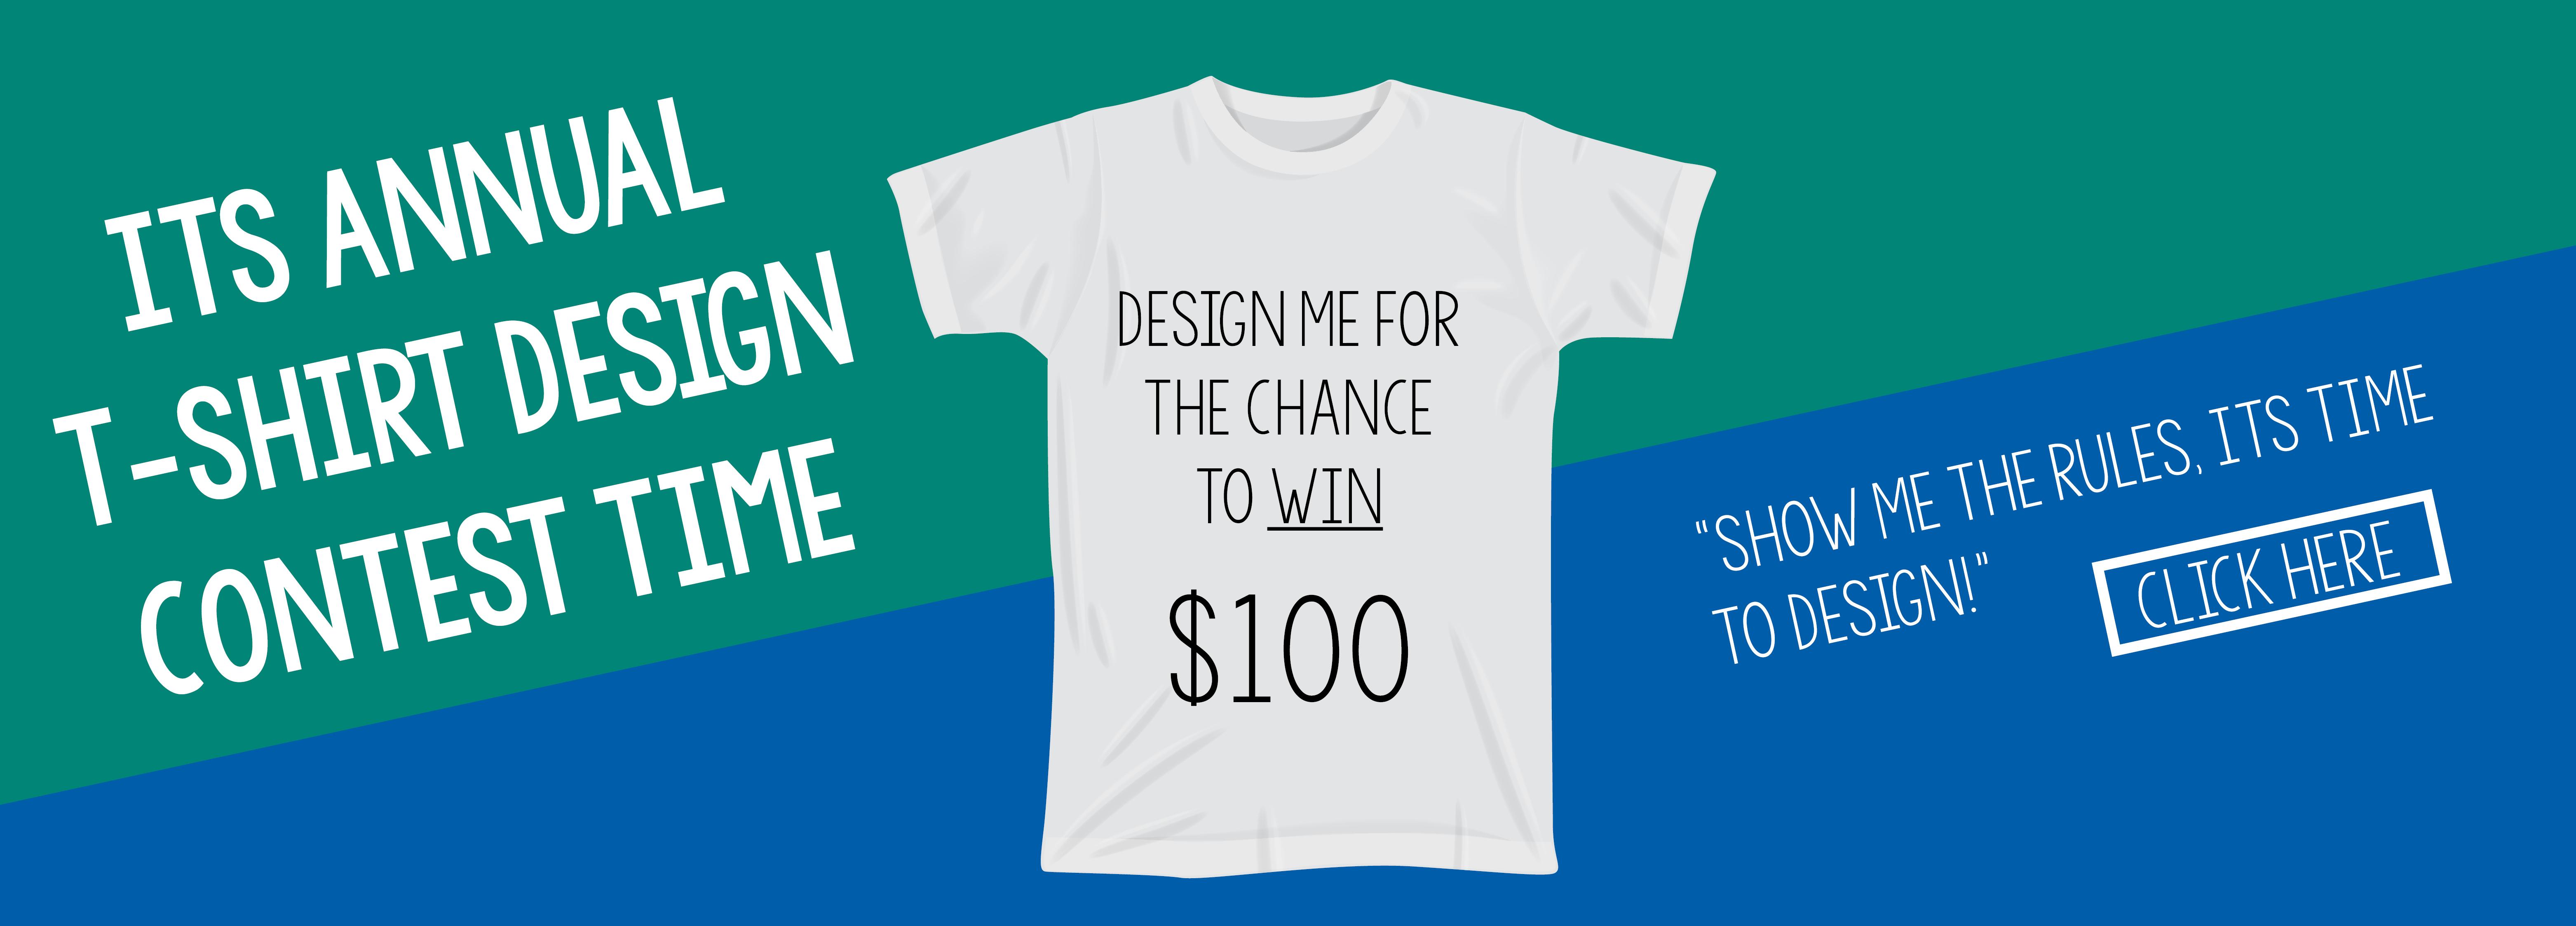 Annual T-Shirt Design Contest